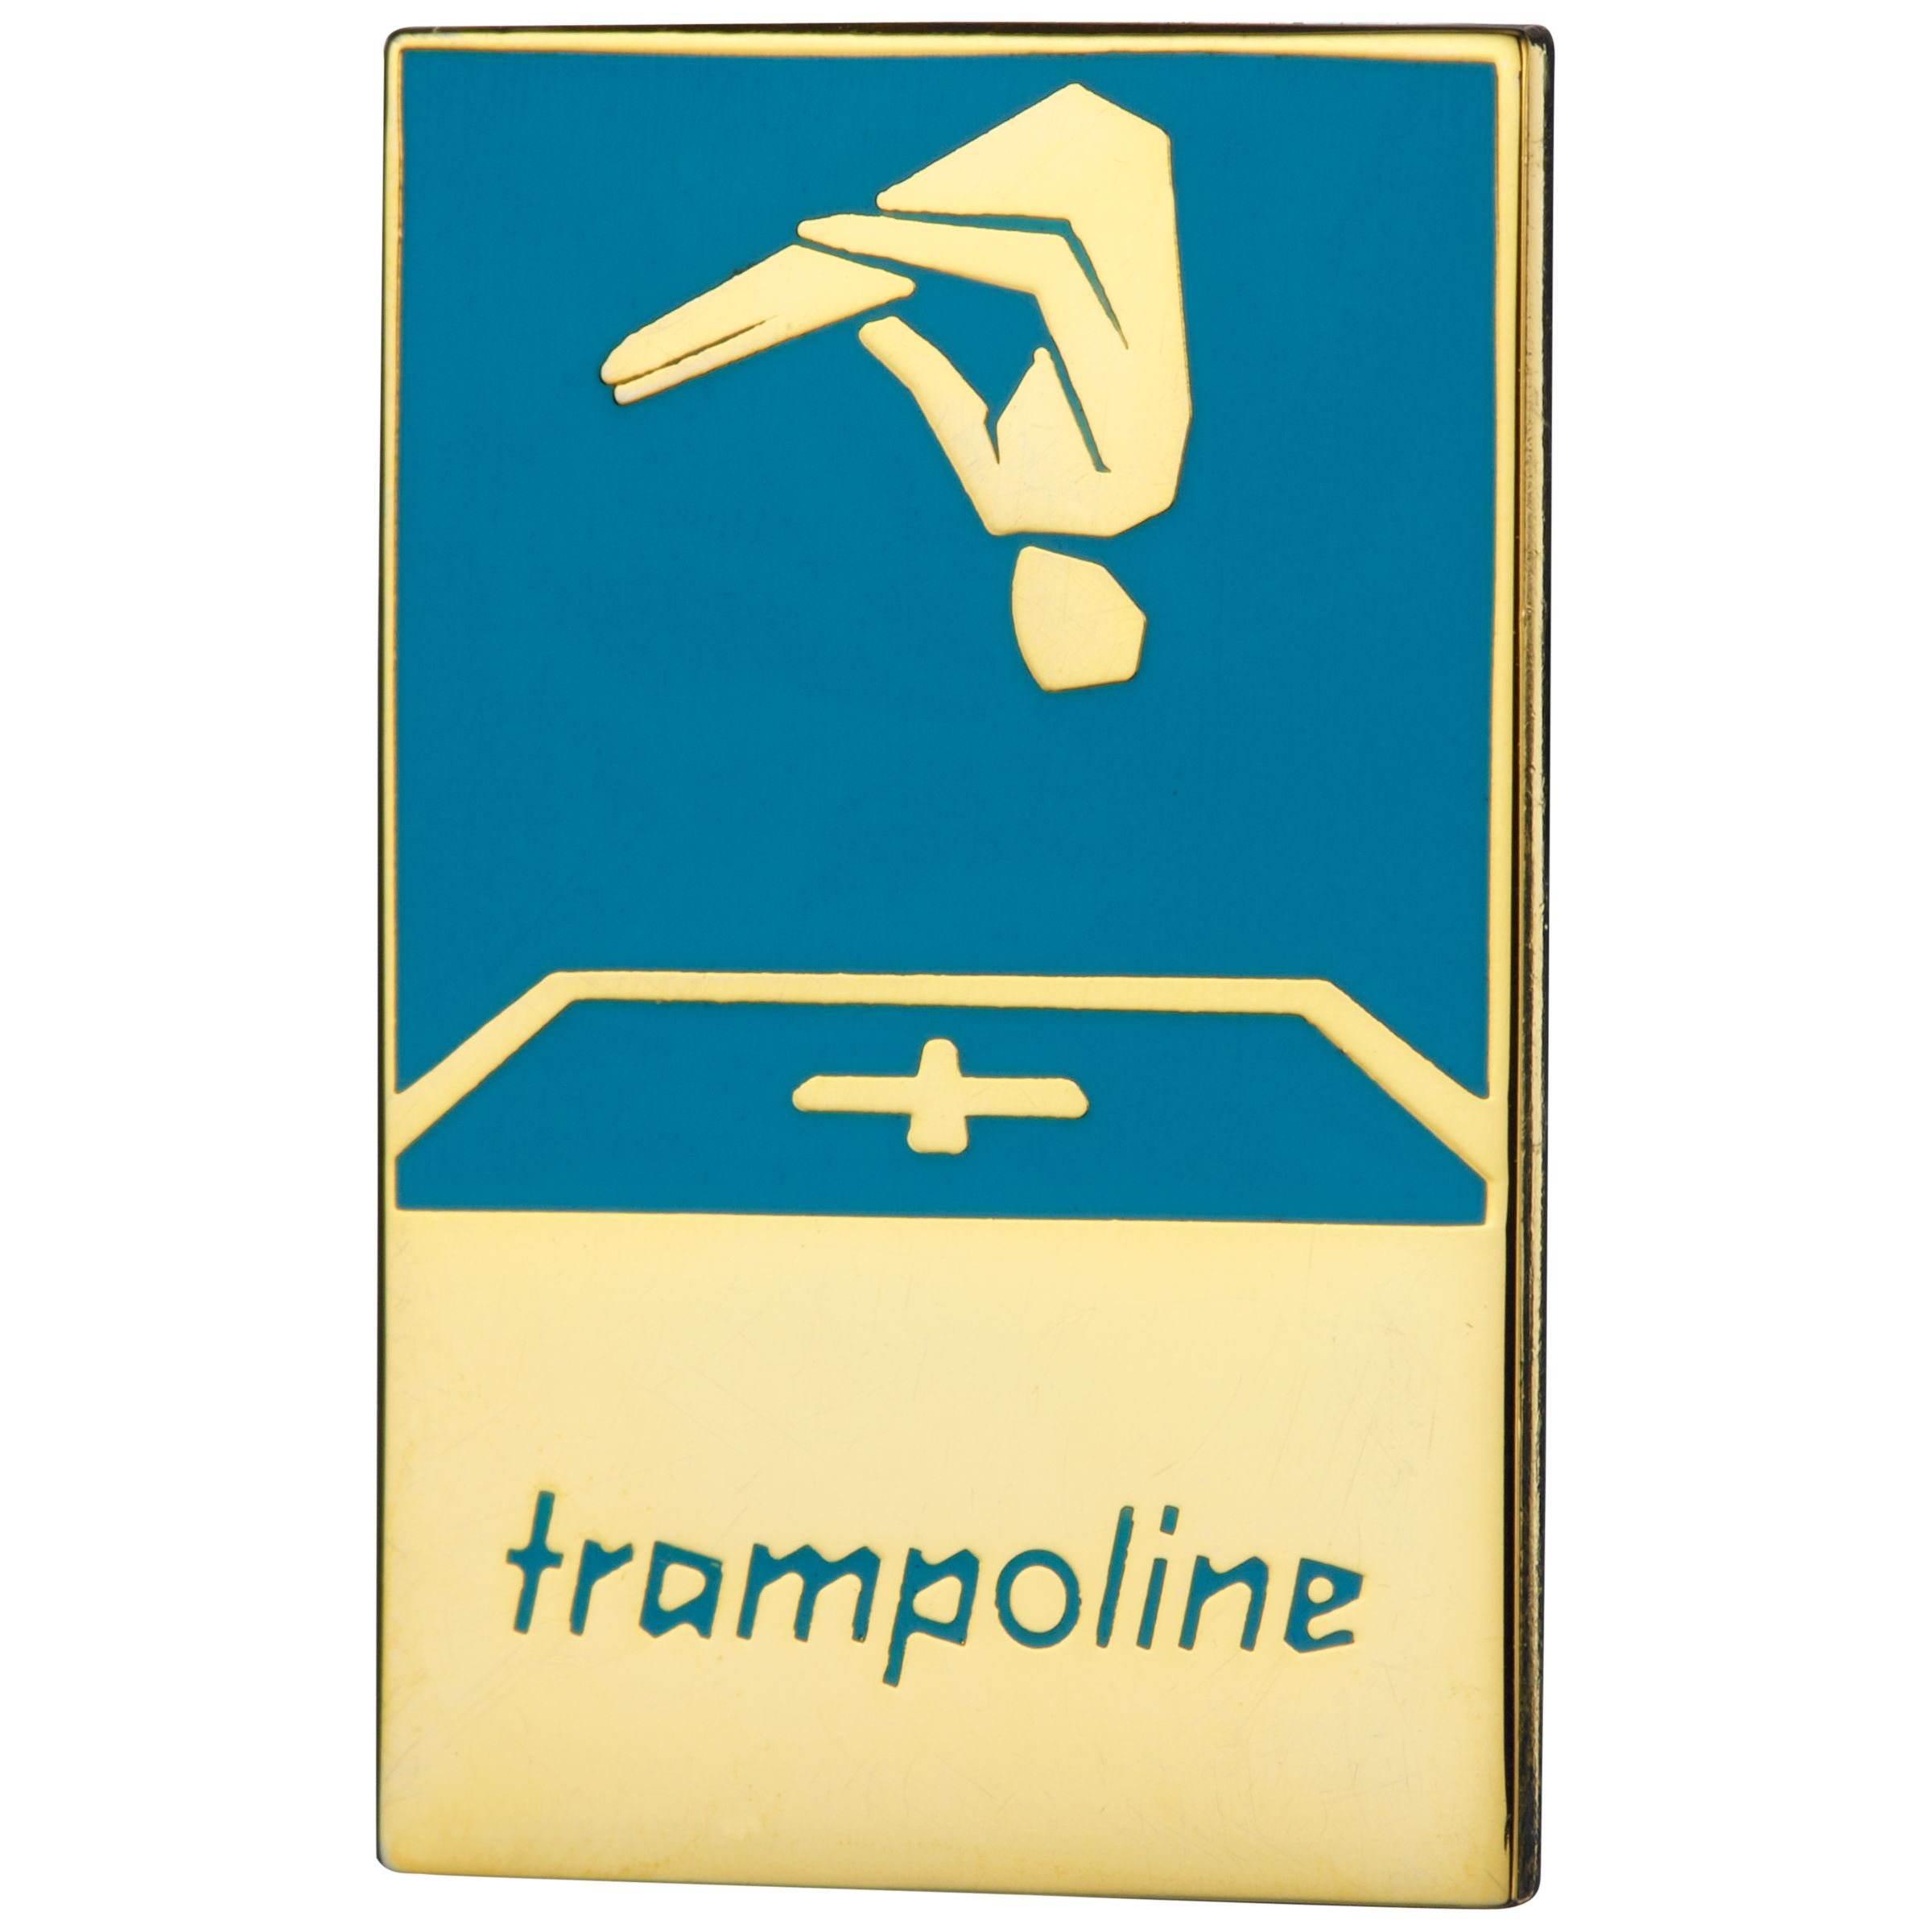 London 2012 Olympic Games Pin Badge, Trampoline